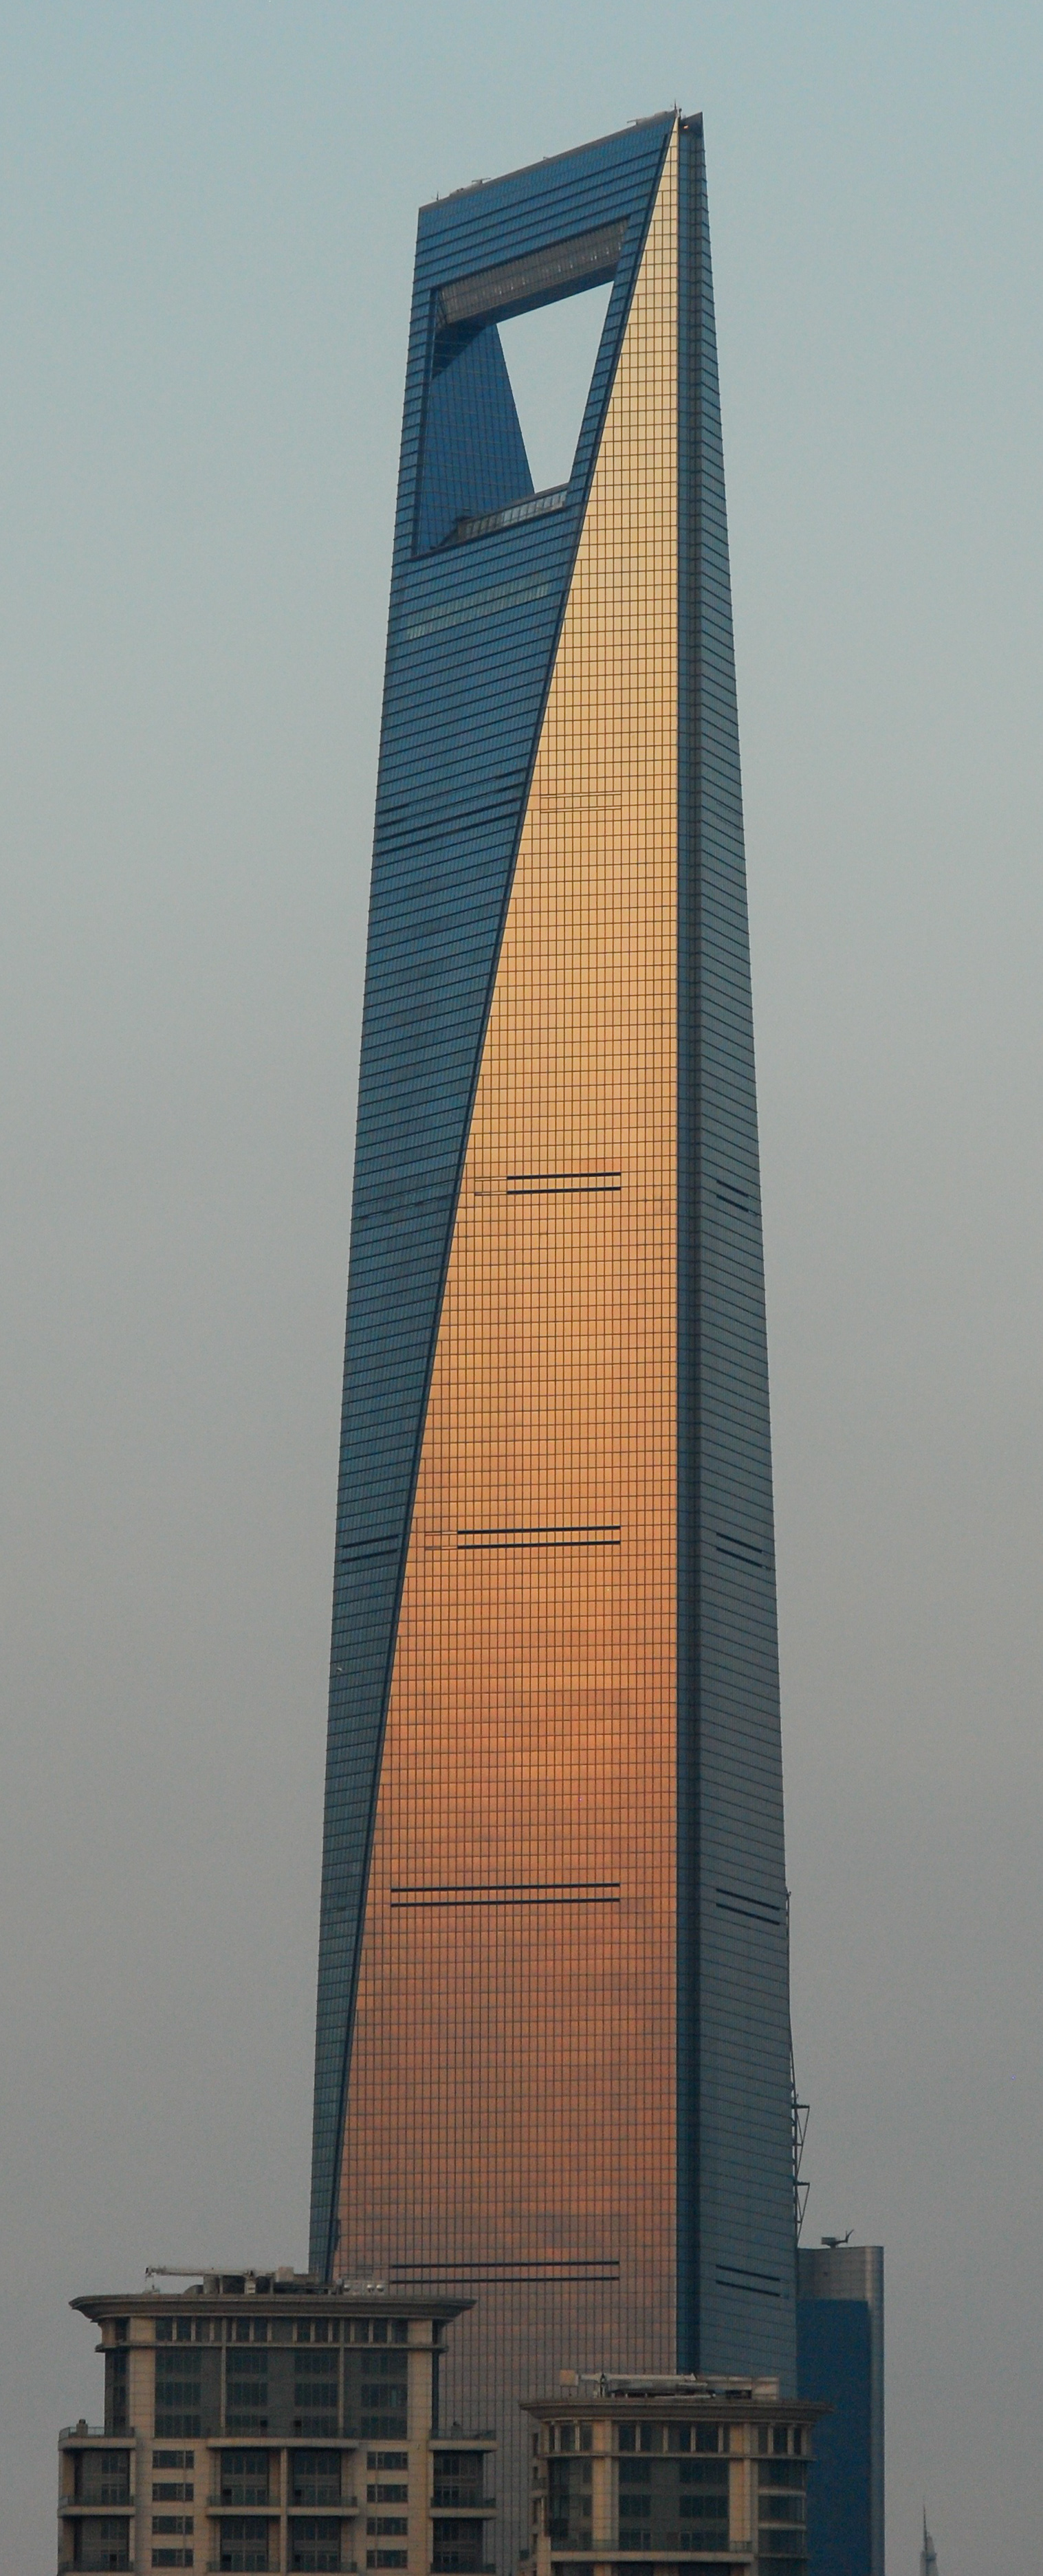 Shanghai_World_Financial_Center_in_evening_light%2C_Southwest_view_20090906_1